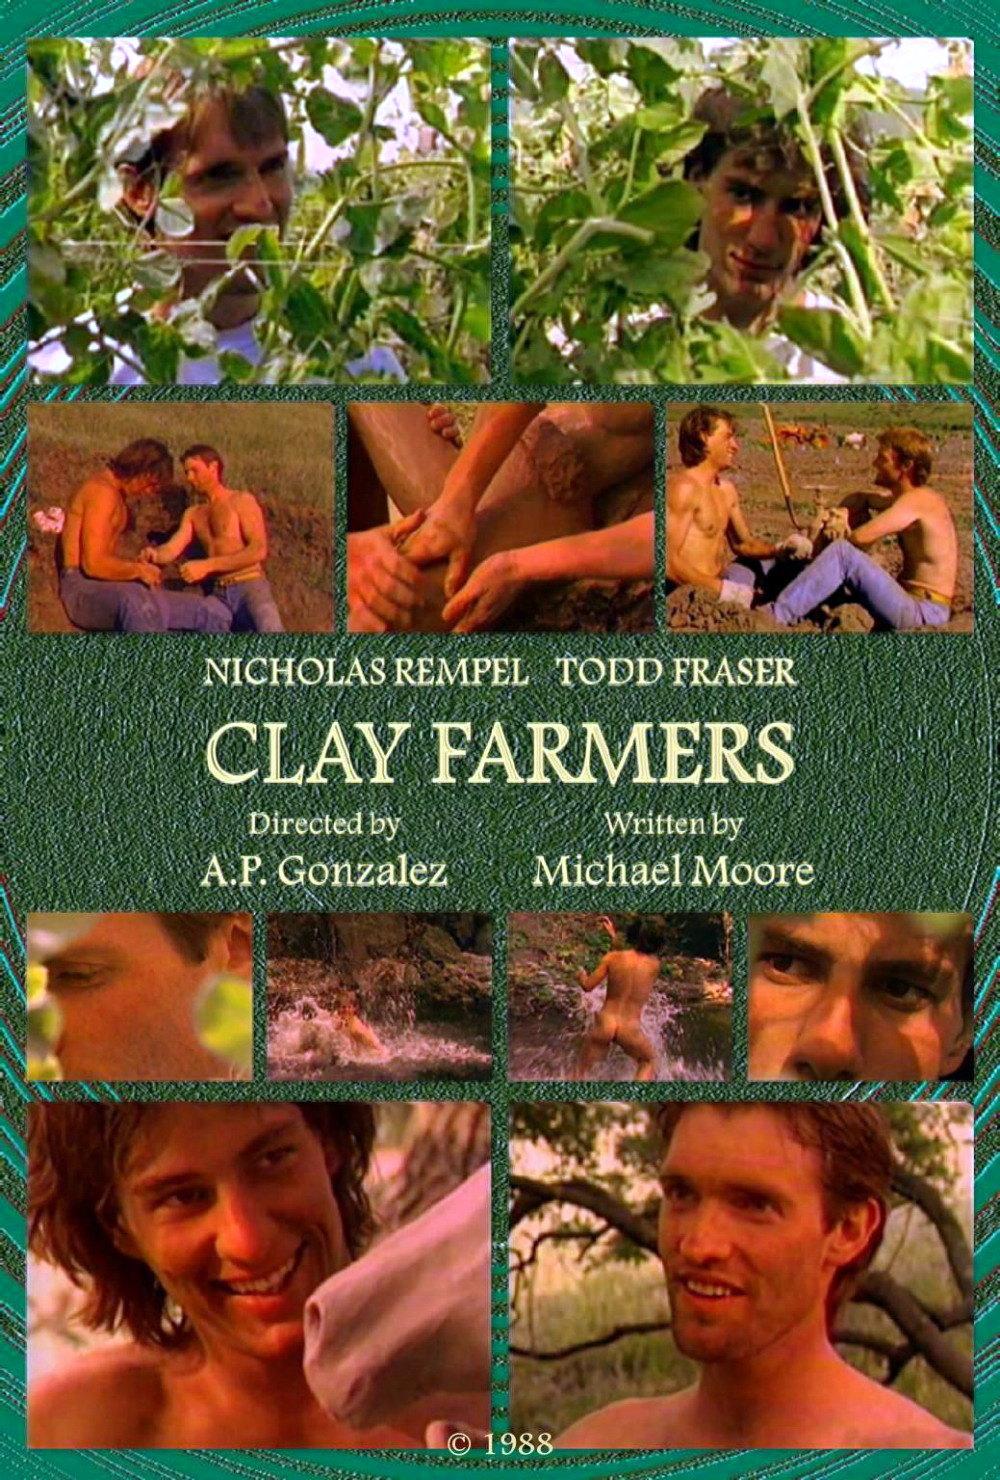 Clay Farmer (1988)